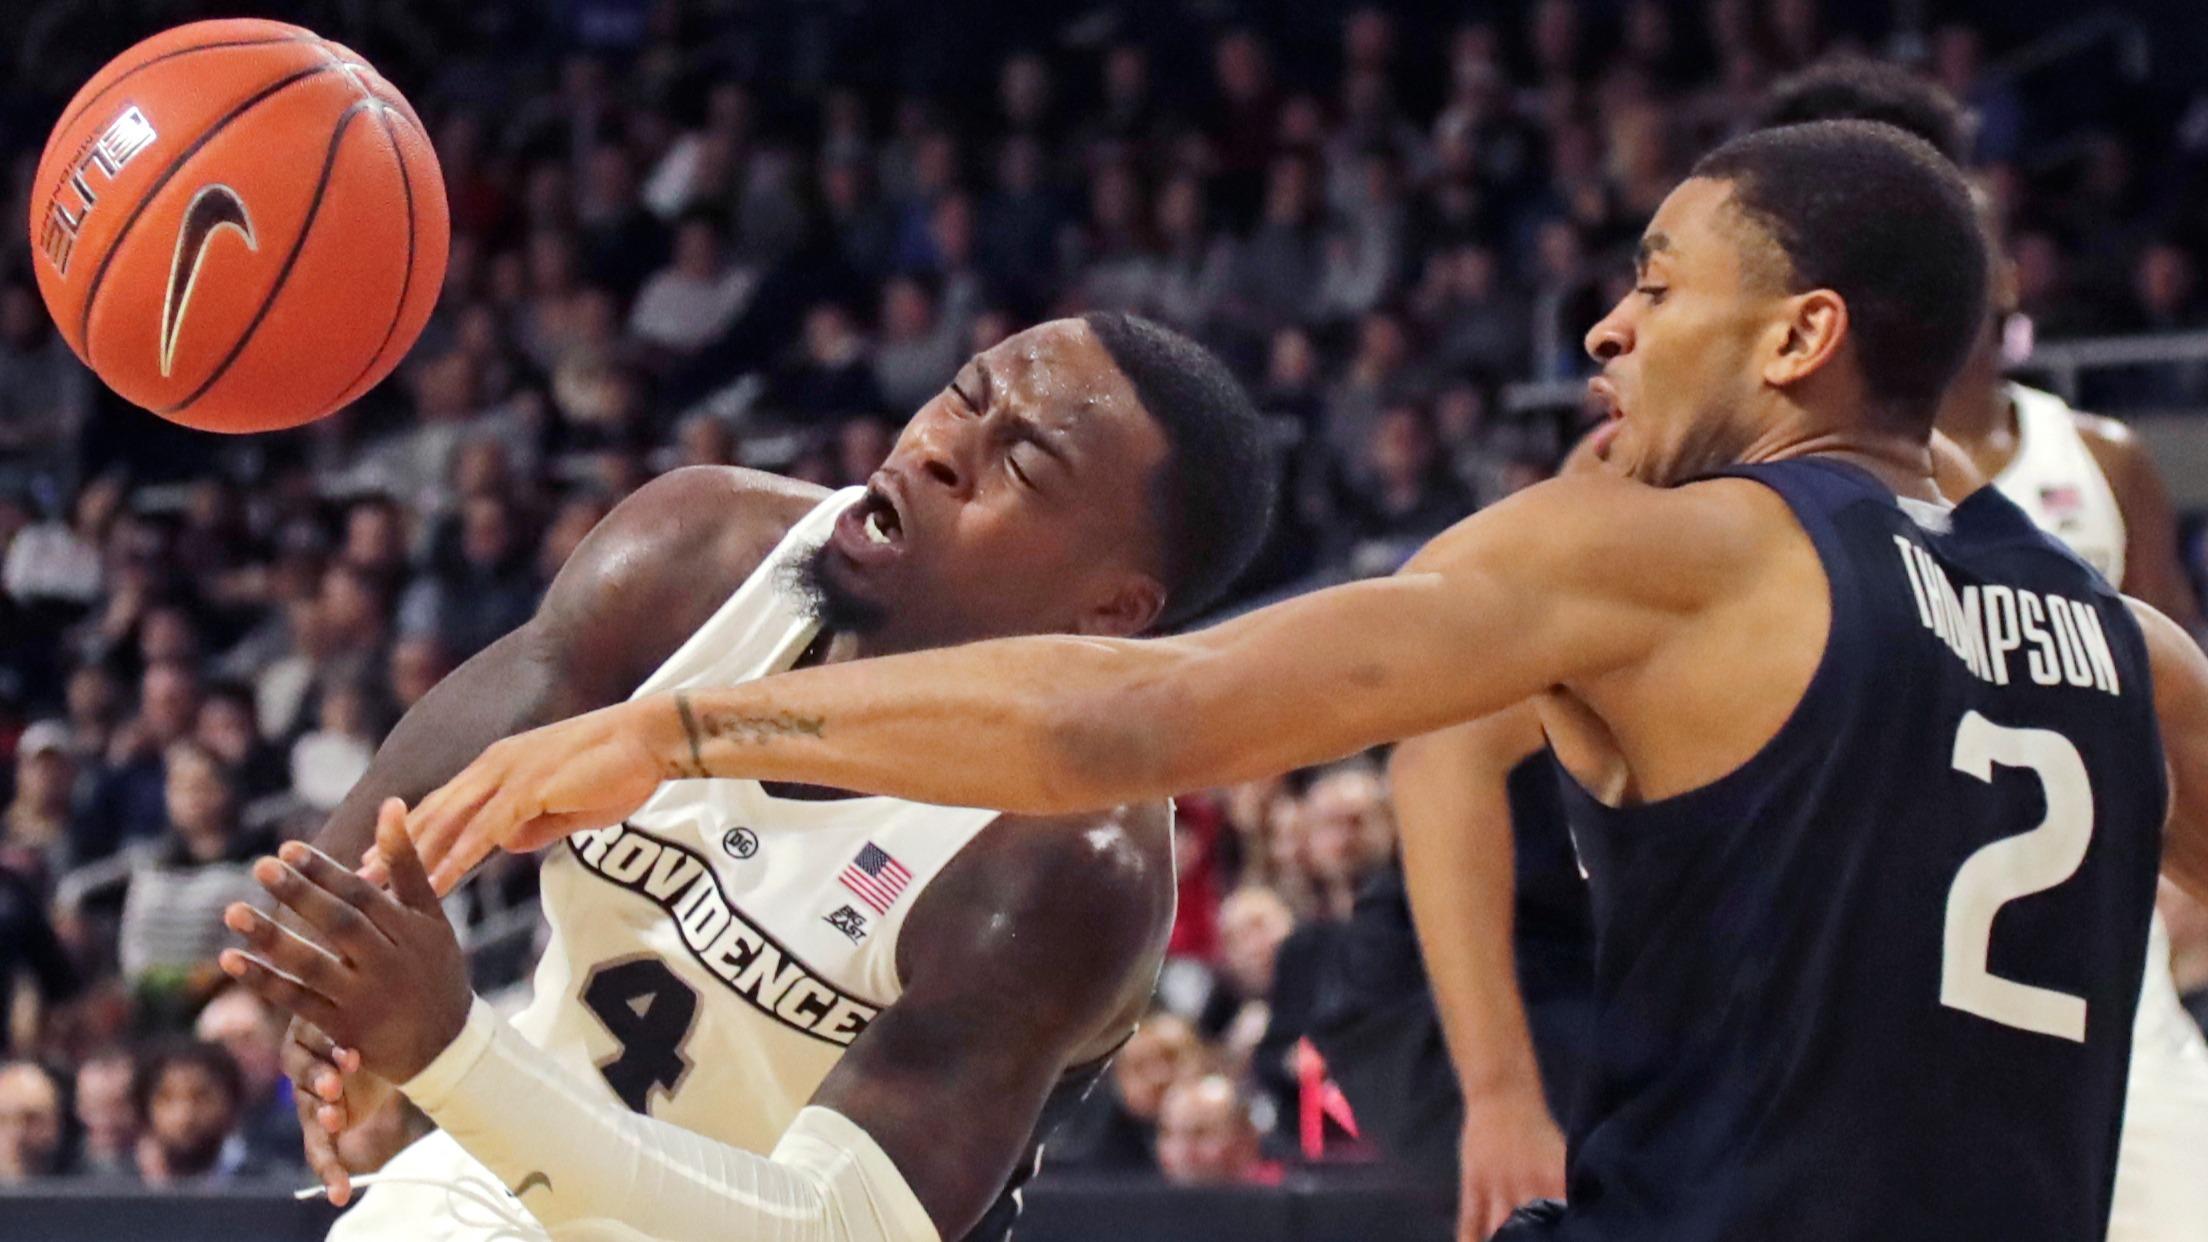 Wednesday College Hoops Odds Trends Picks Butler Favored